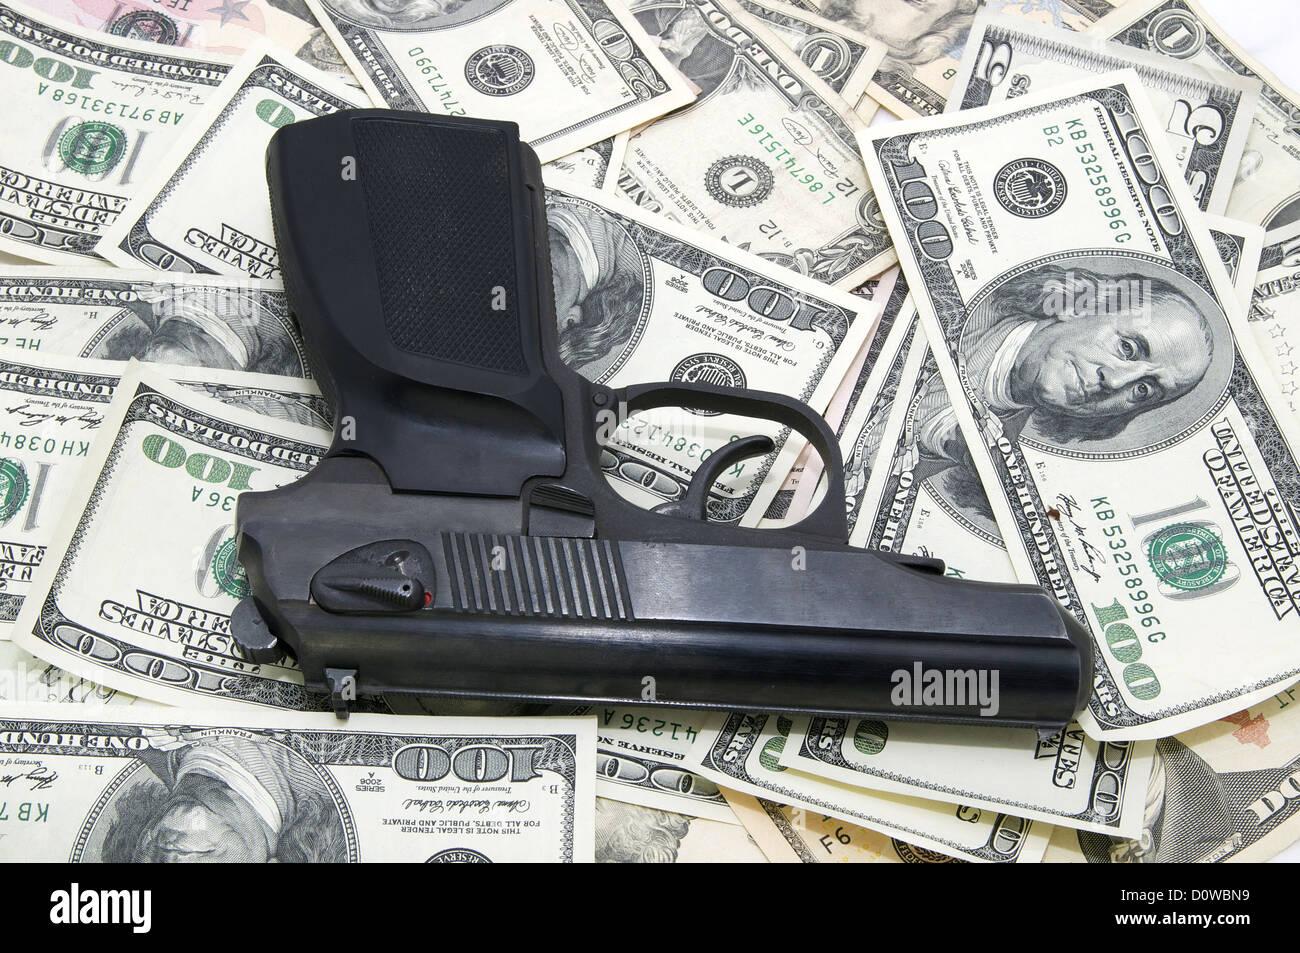 Gun and dollars - Stock Image